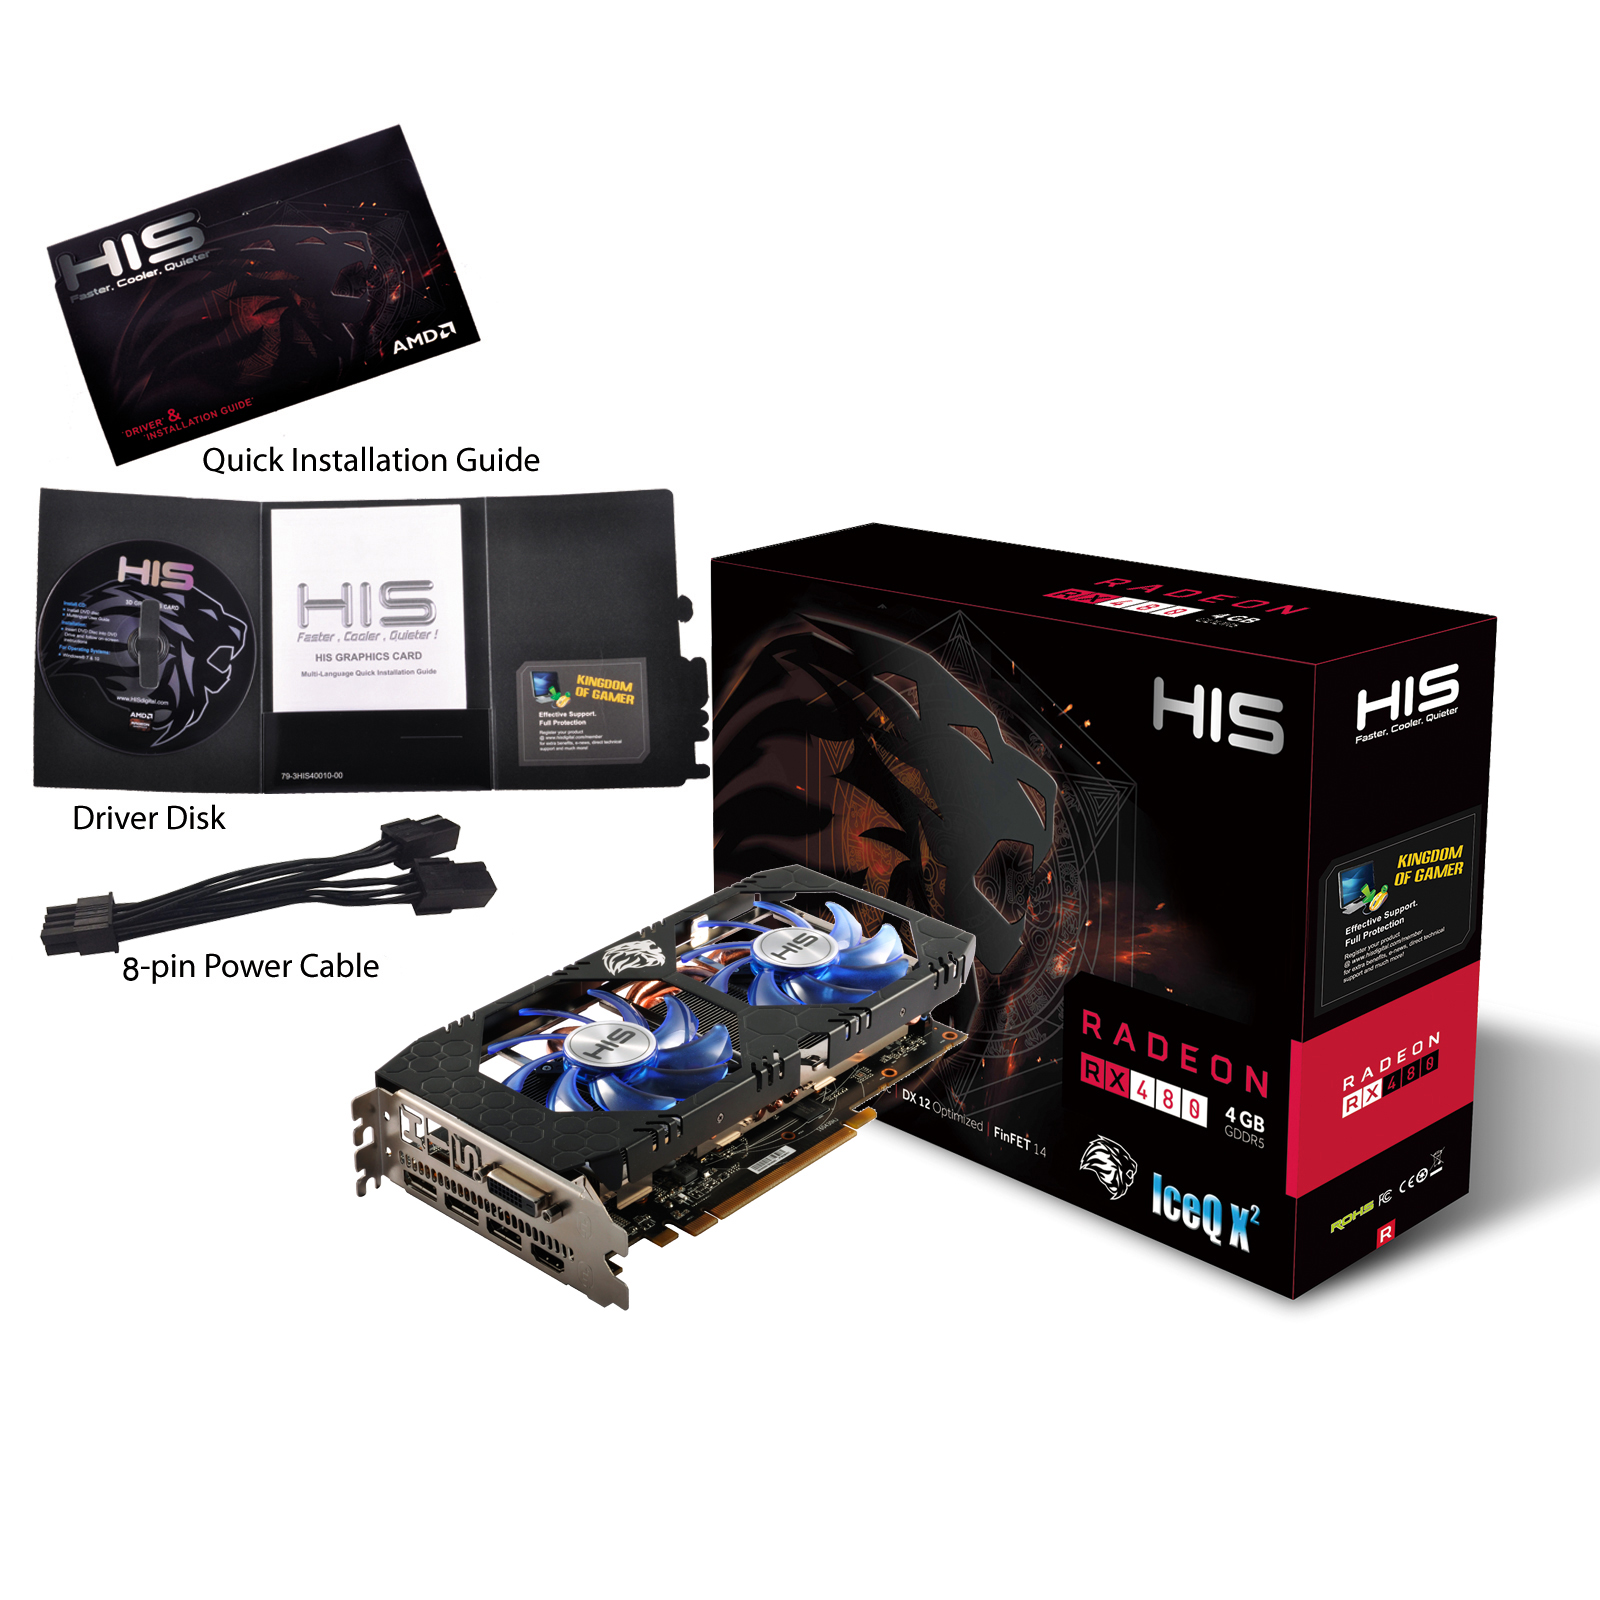 HIS RX 480 IceQ X² 4GB < RX 480 Series < Desktop graphics